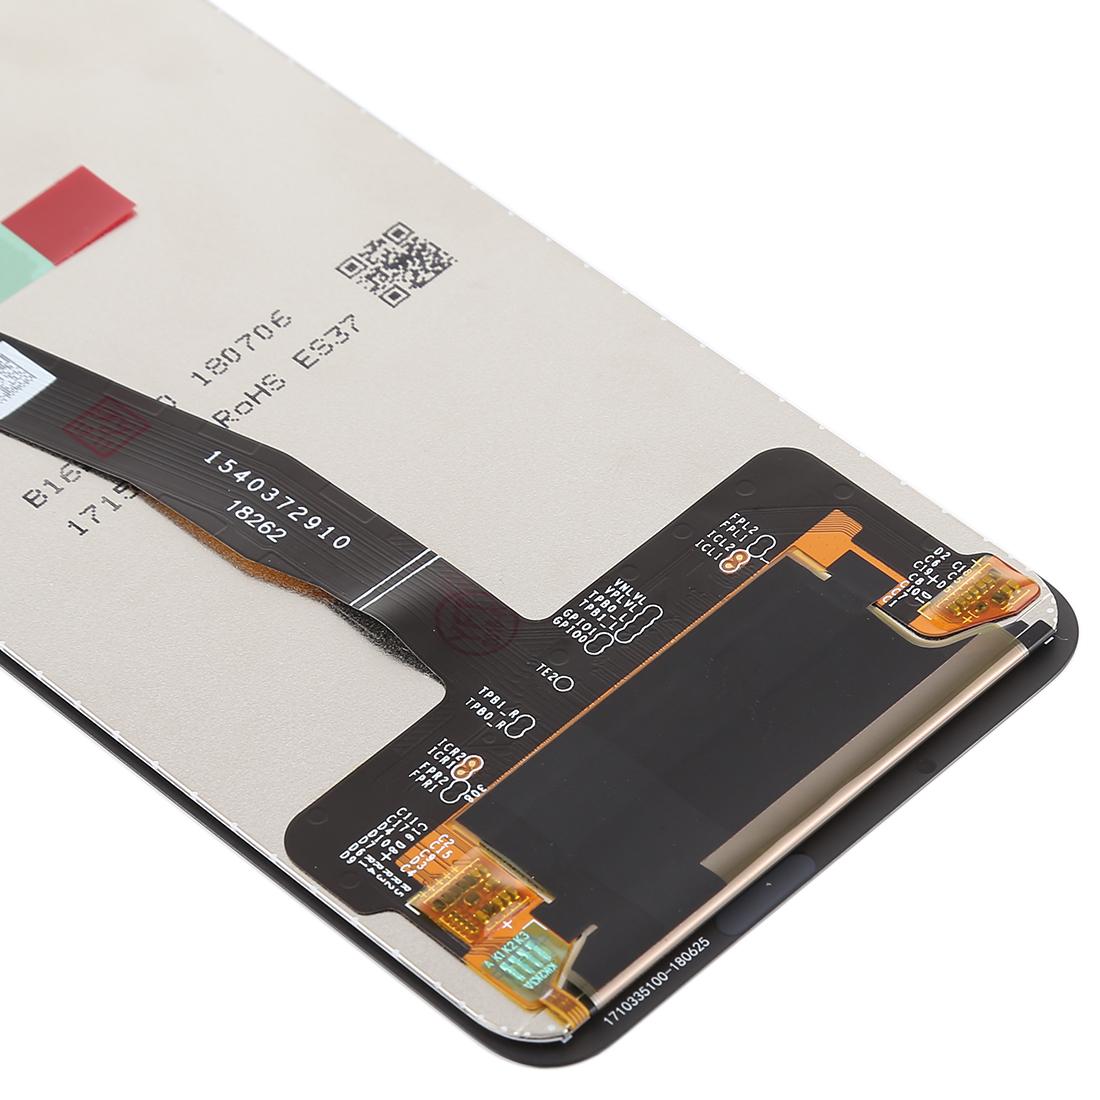 صفحه-نمایش-گوشی-موبایل-lcd-touch-screen-Honor-10-Lite(3).jpg